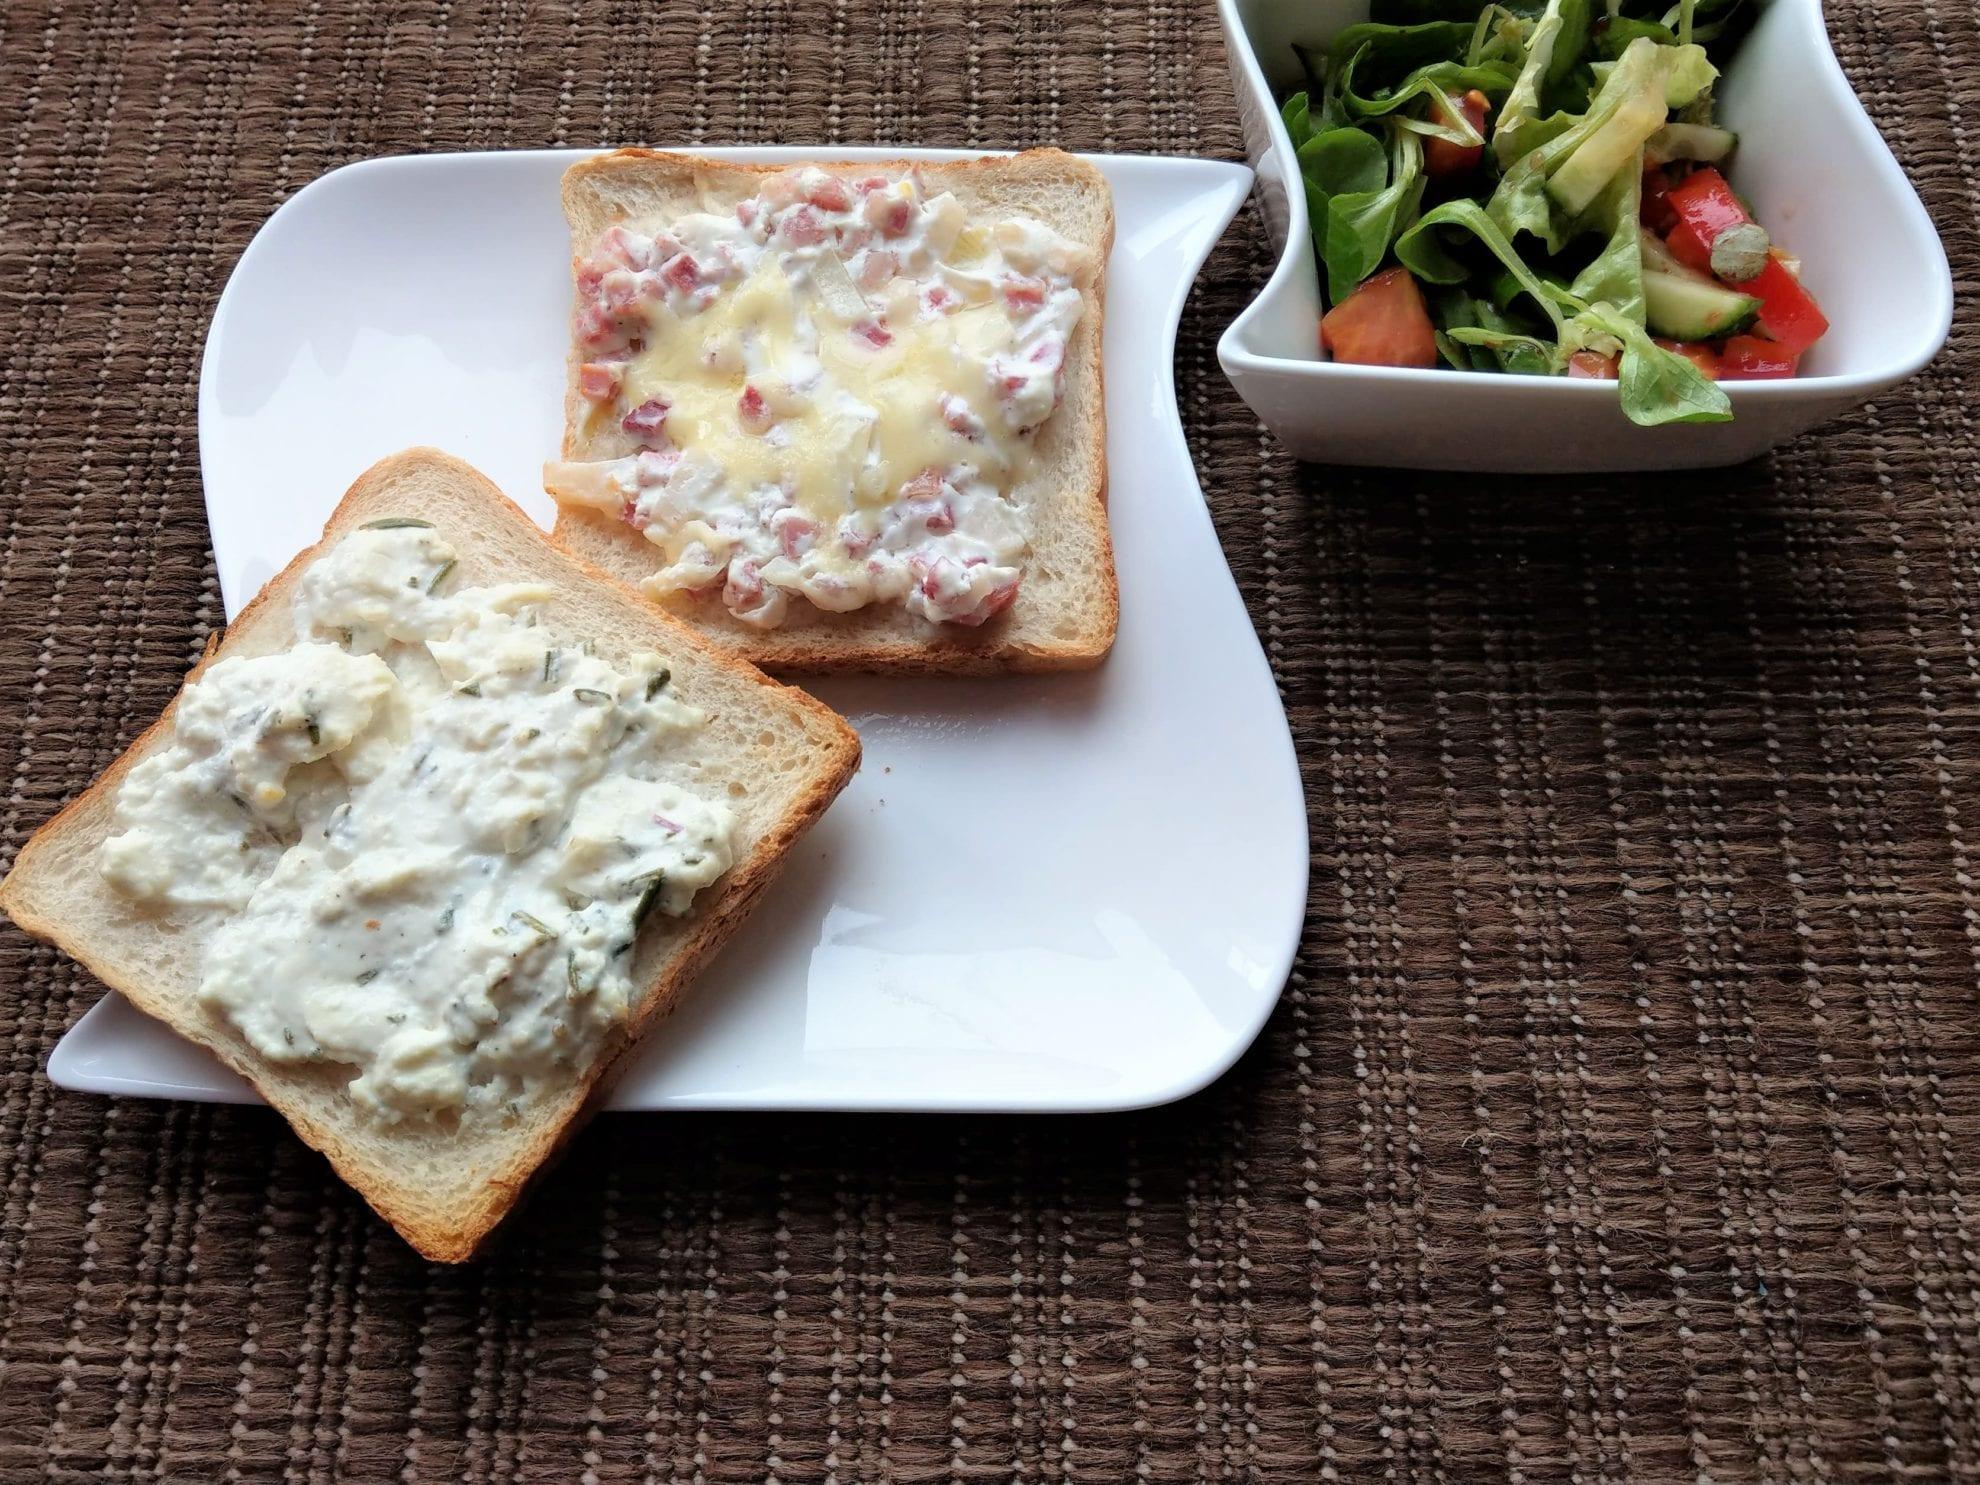 Flammkuchentoast, Toast, Flammkuchen, Rezept, simpel, mit Kindern kochen, Kochen mit Kindern